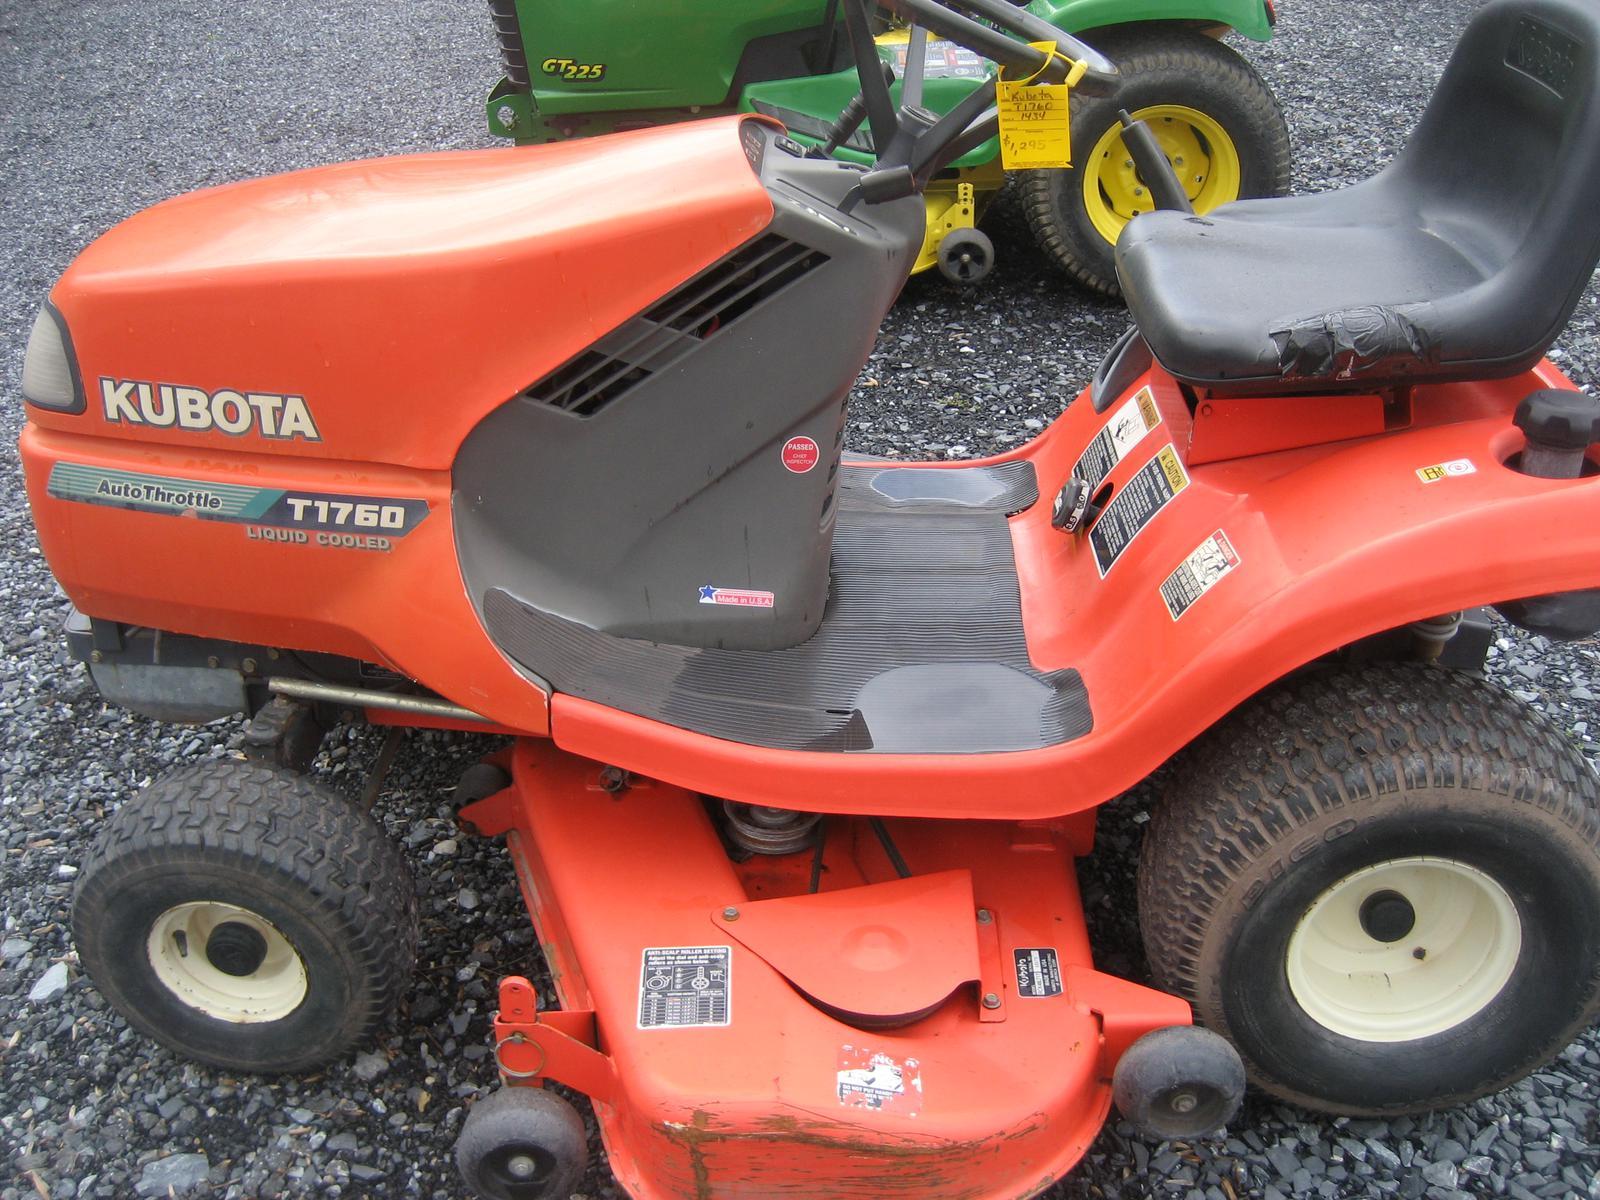 Kubota T1760 Mower Manual Wiring Diagram \u2022 Toro Mower Deck Belt Diagram  Kubota T1760 Parts Diagram